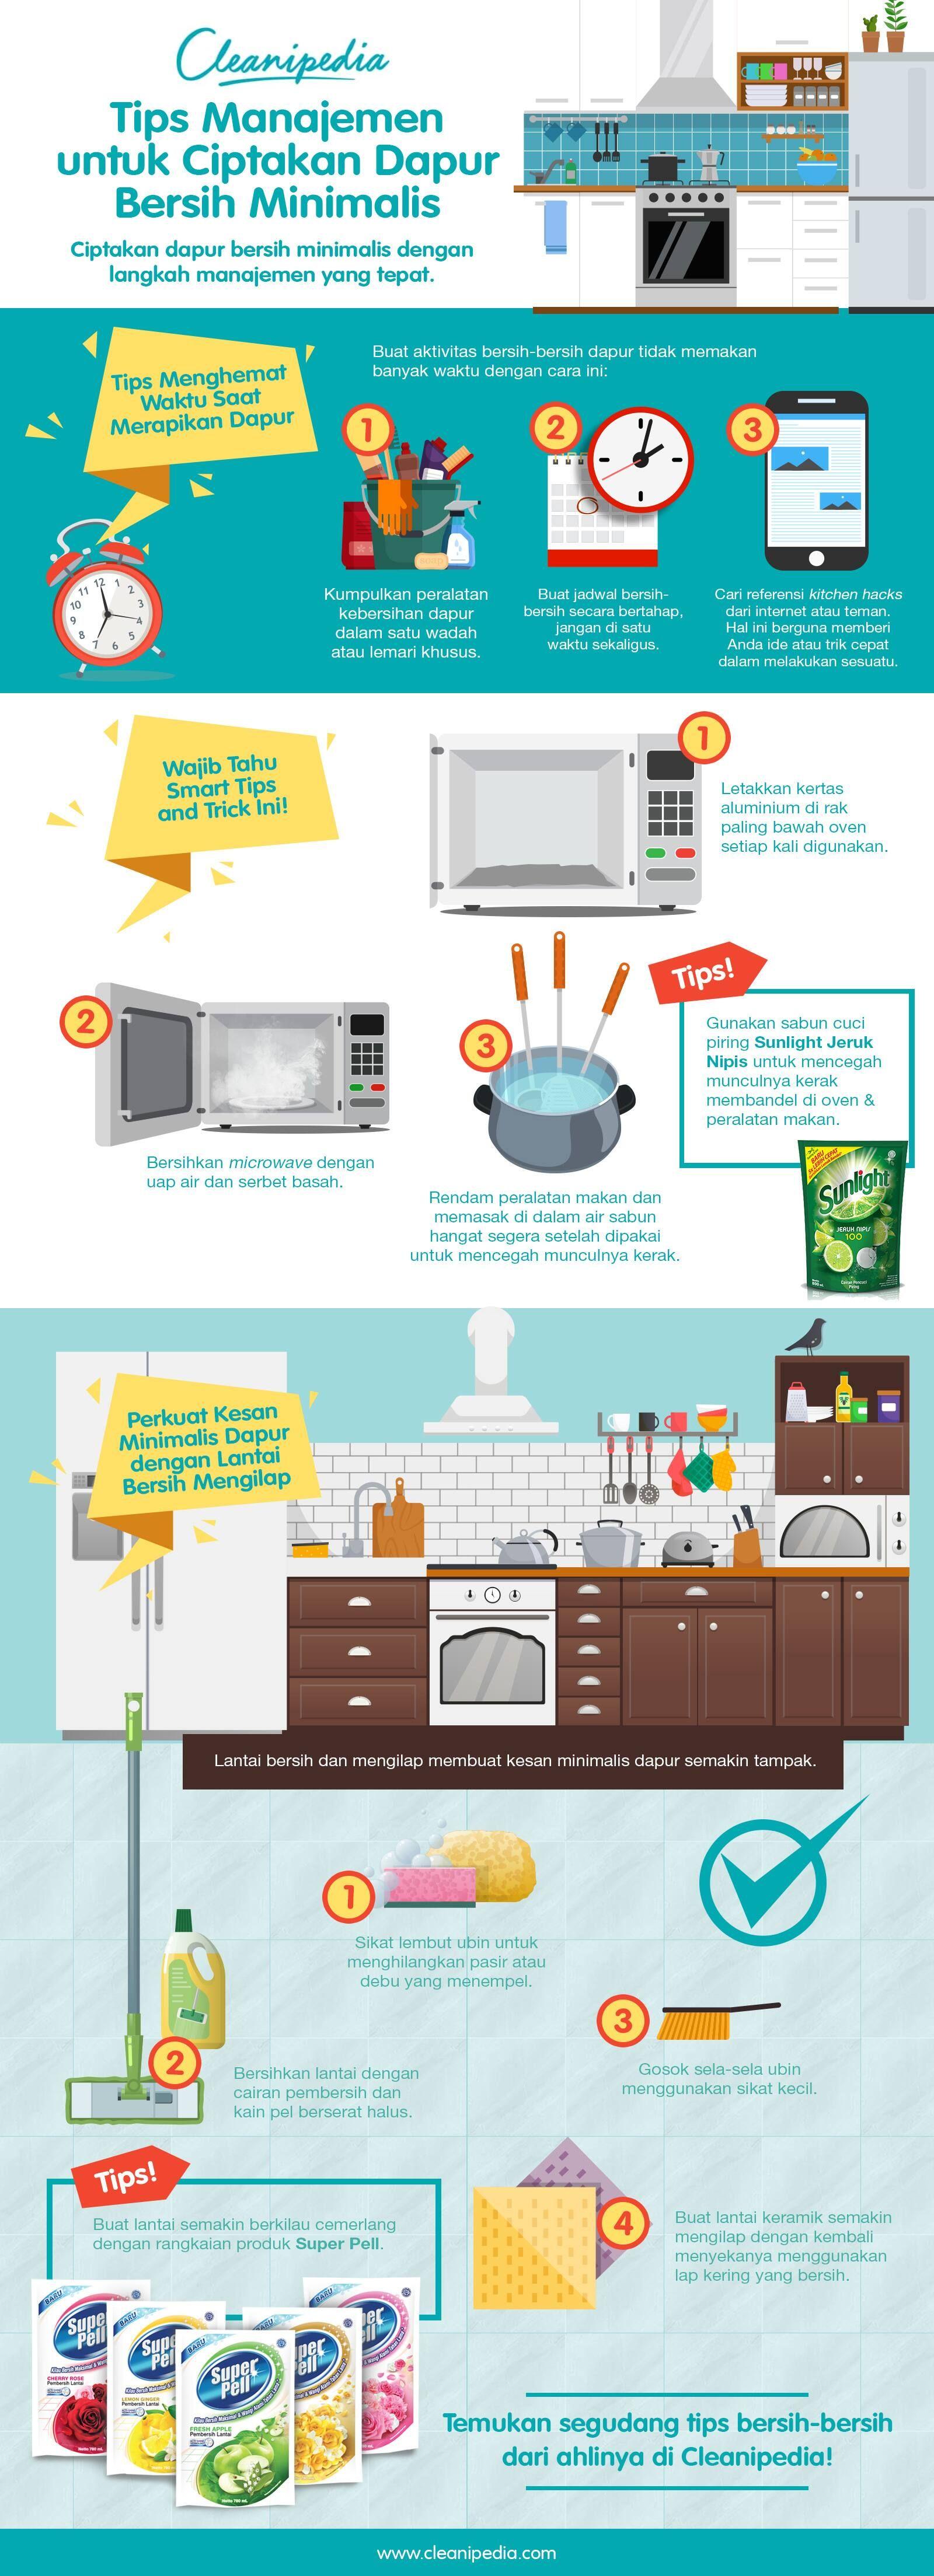 Ciptakan dapur bersih minimalis dengan langkah manajemen yang tinggi